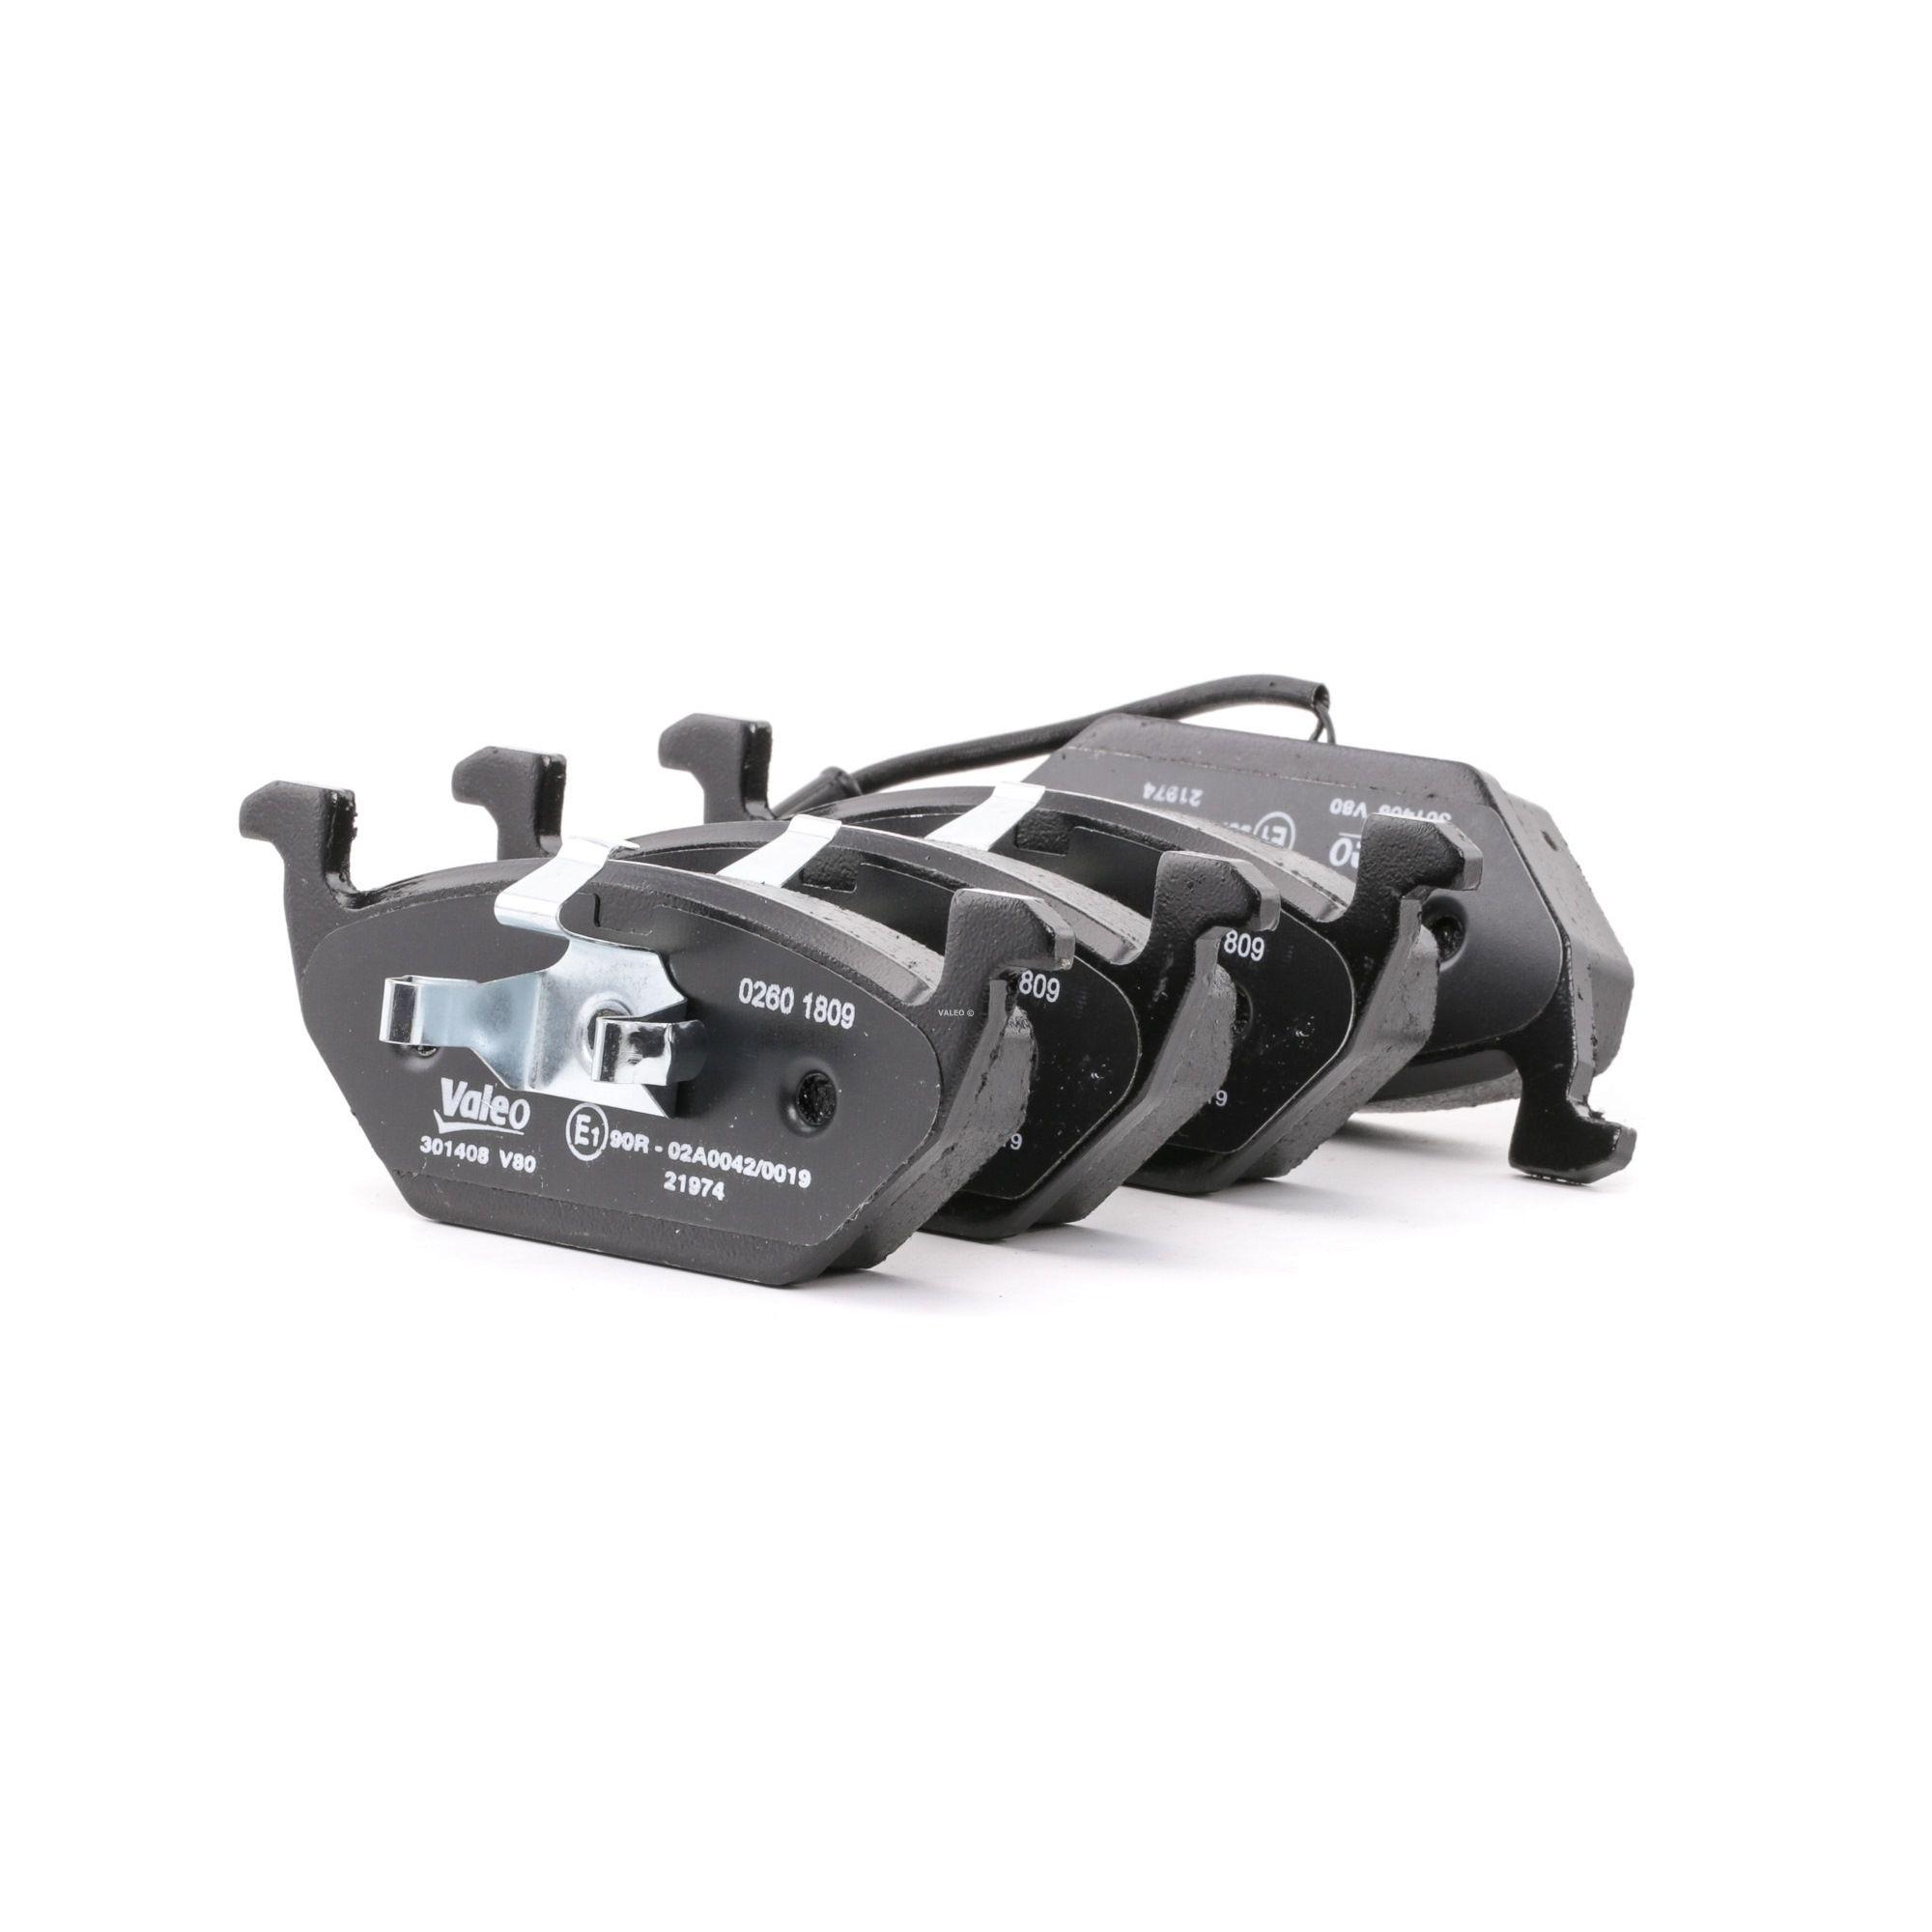 Buy Brake pads VALEO 301408 Height 2: 54,7mm, Height: 54,7mm, Width 2 [mm]: 146,4mm, Width: 146,4mm, Thickness 2: 18,5mm, Thickness: 18,5mm